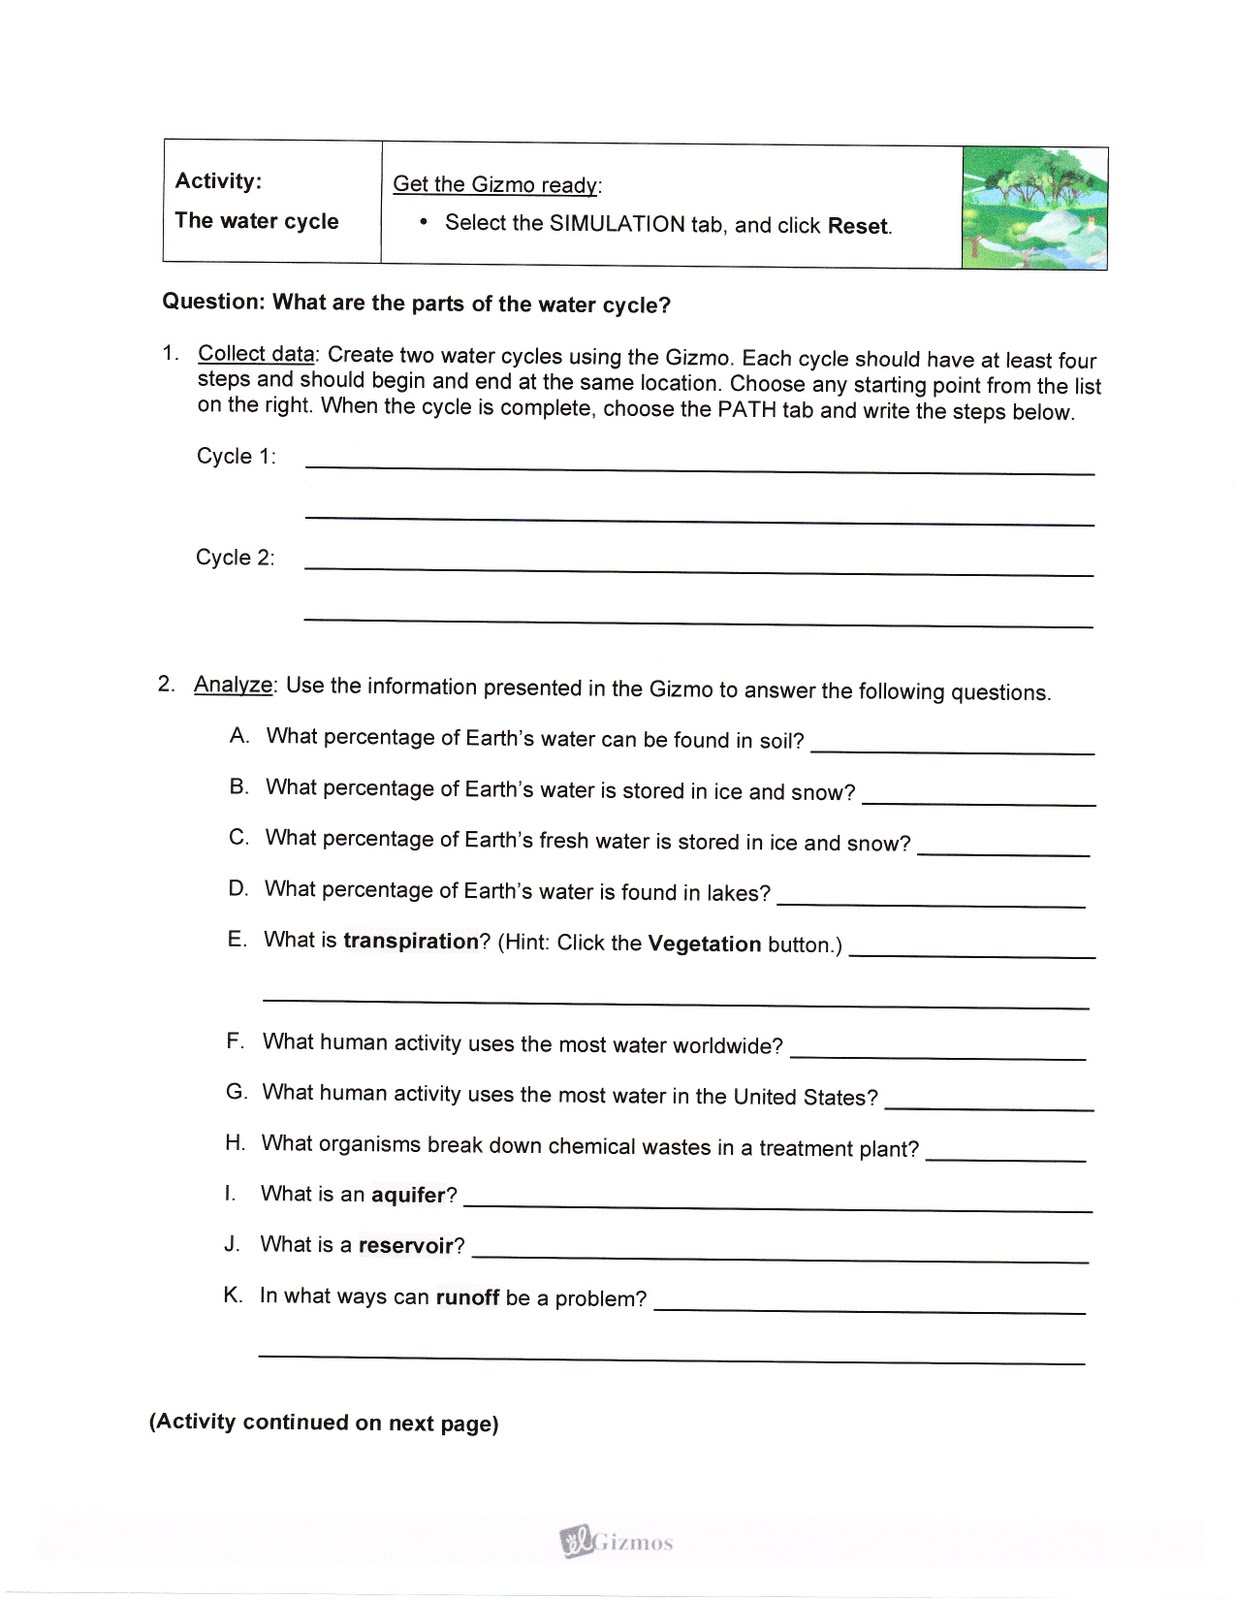 Drden S Sixth Grade Science Class Tuesday 12 October